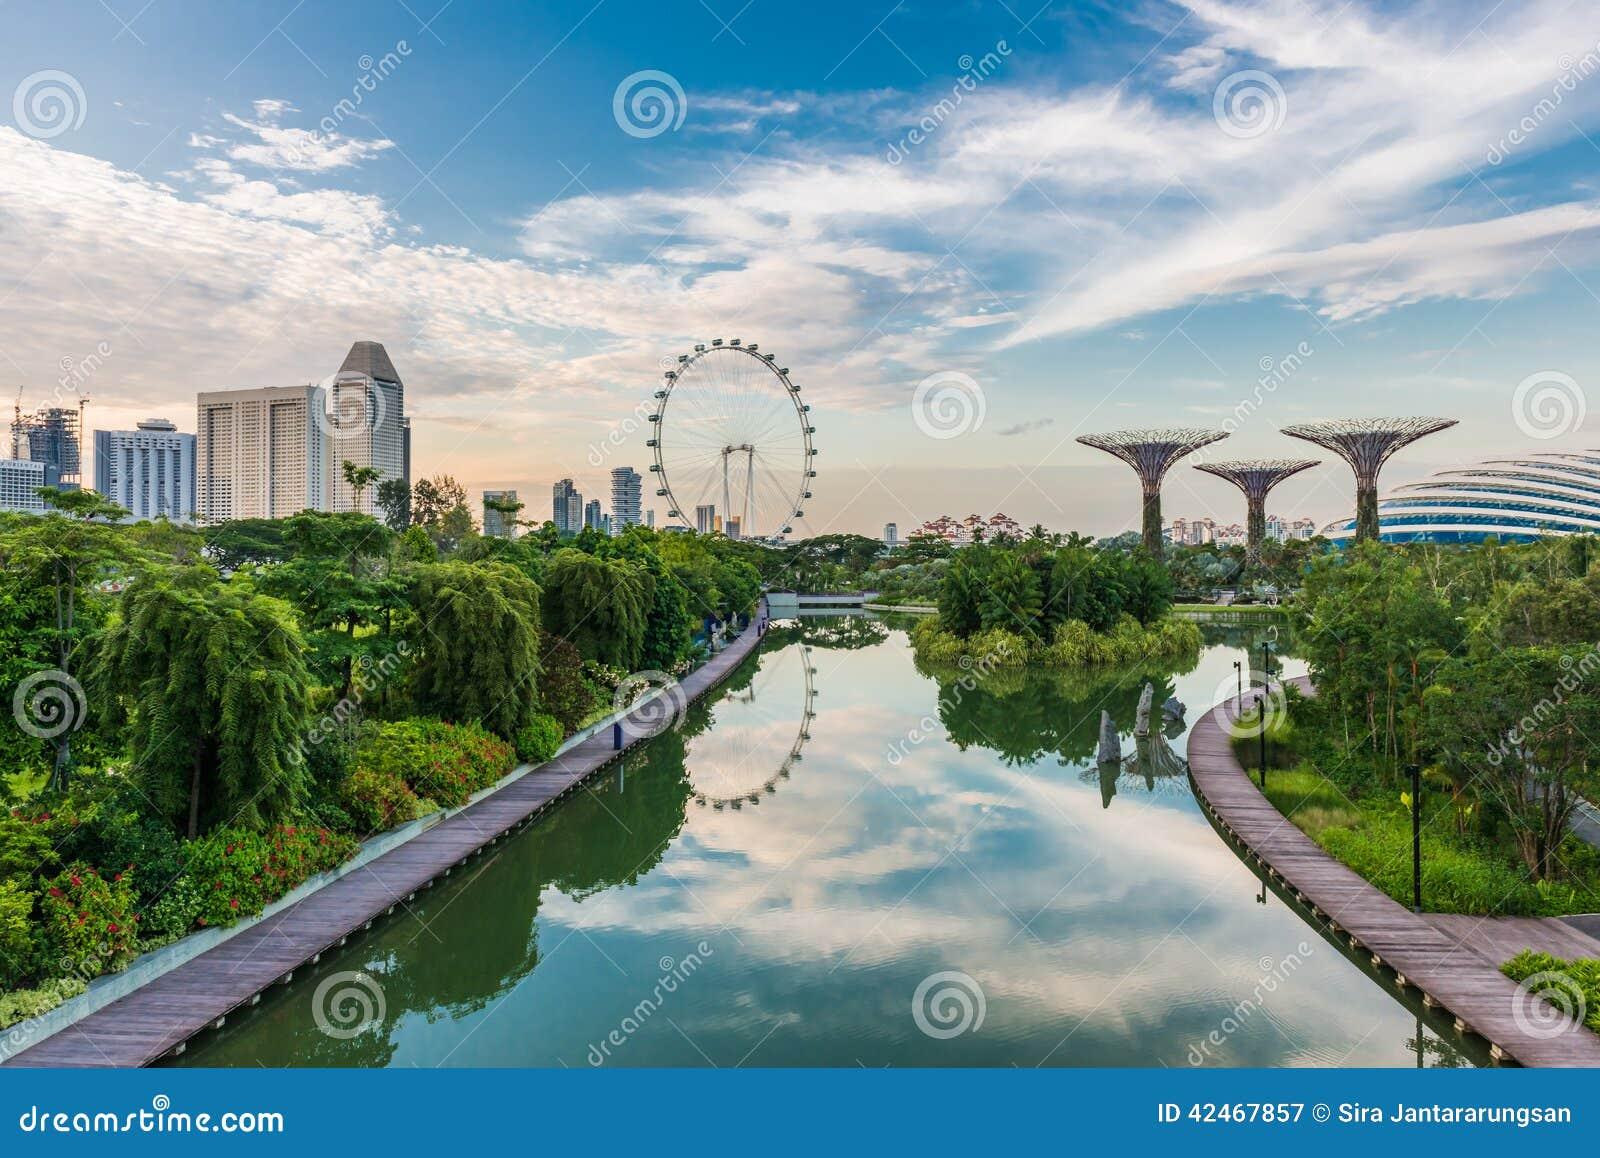 SINGAPUR - 19. JUNI: Singapur-Flieger - größte Ferris Wheel I